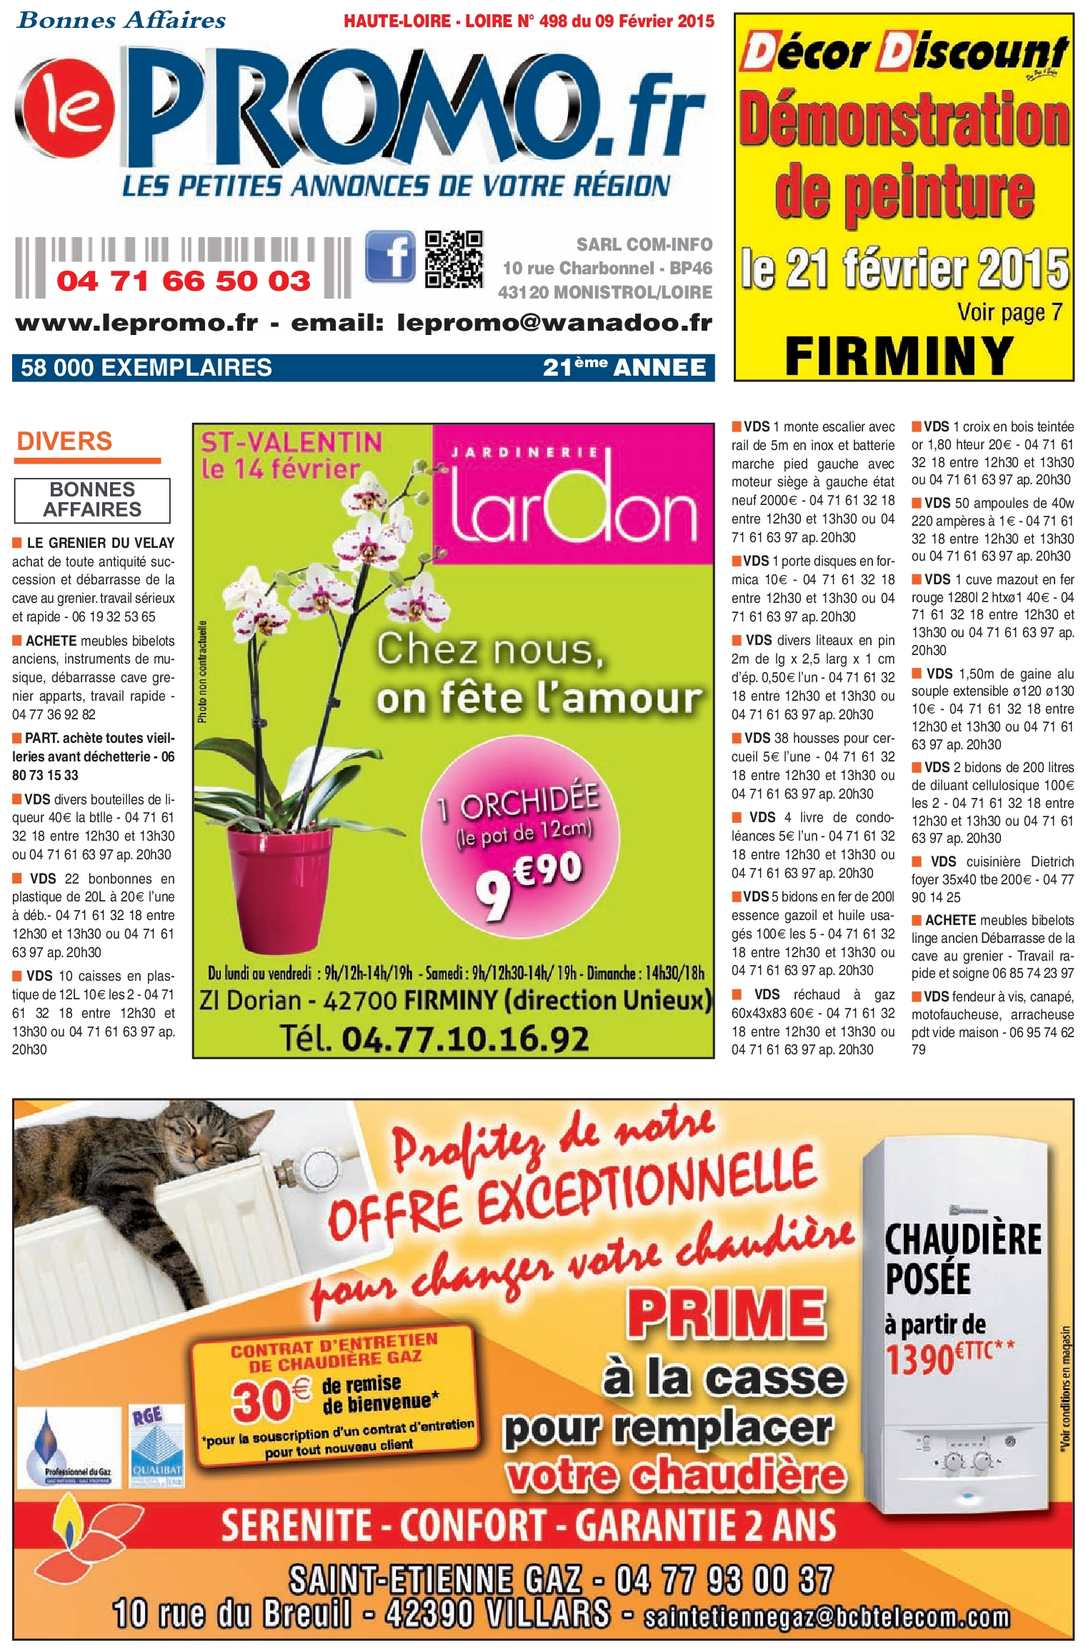 Calaméo - Promo 498 pour Piscine Discount Firminy